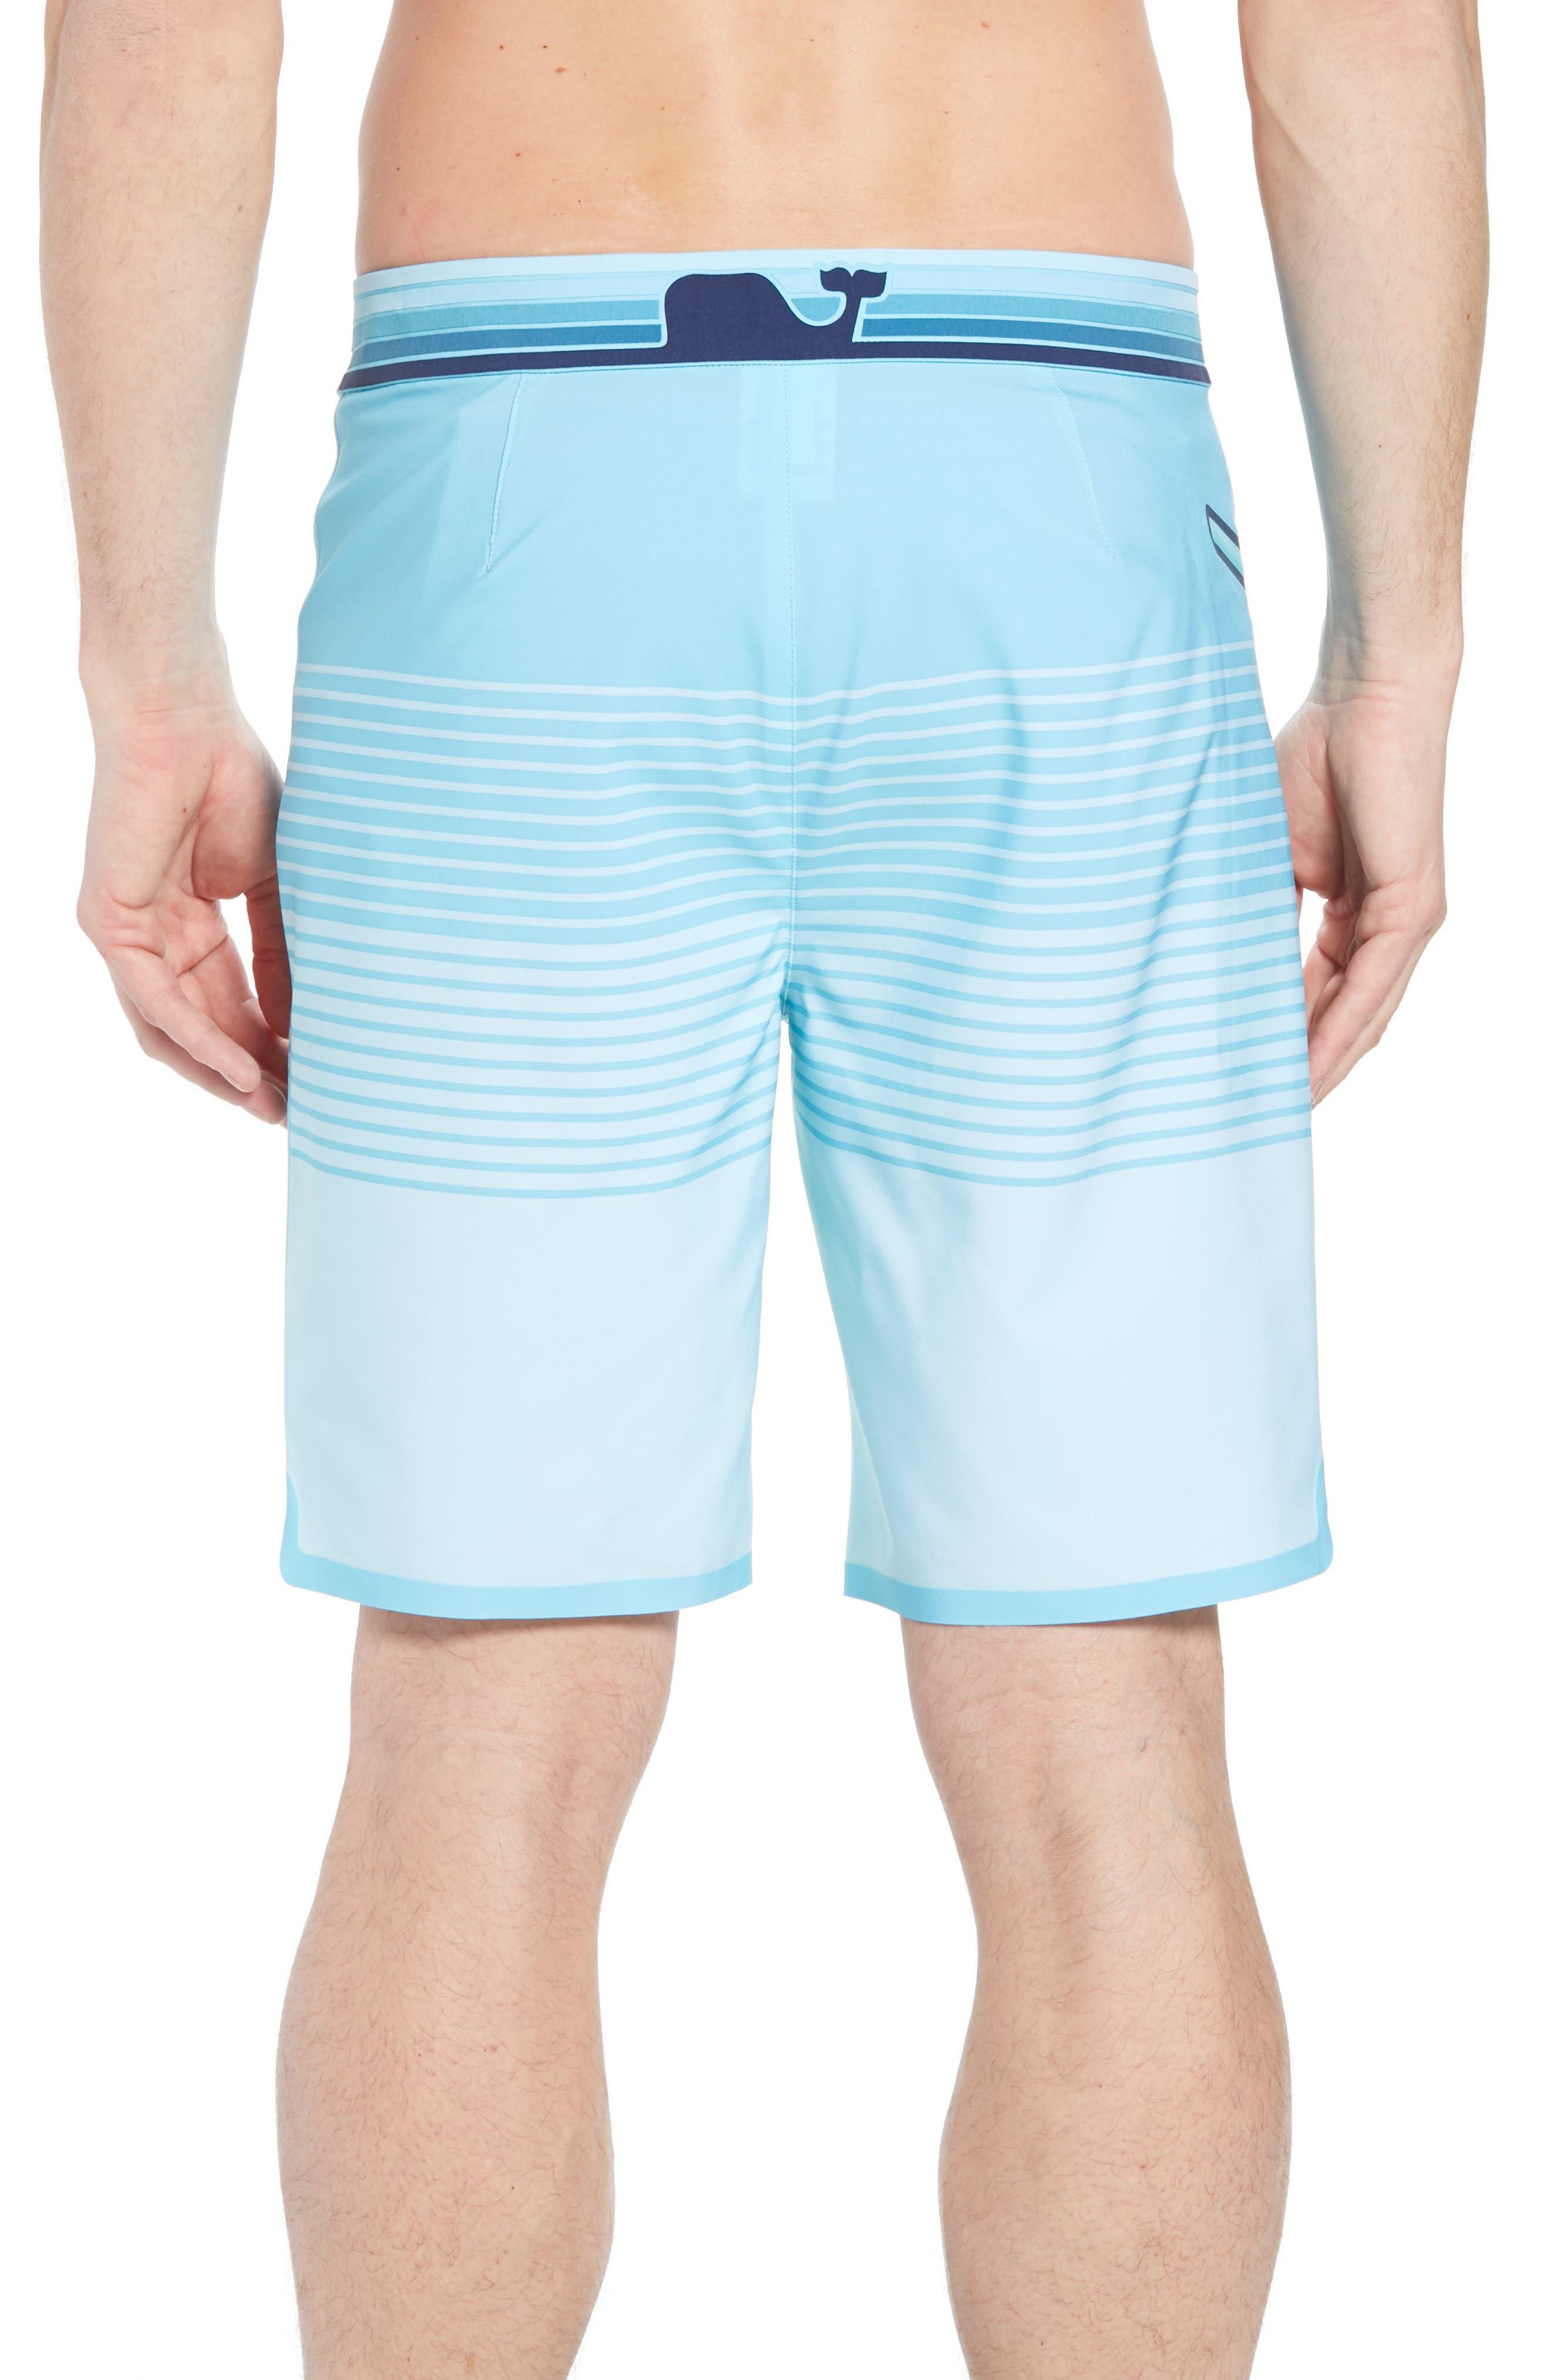 Sculplin Stripe Tech Board Shorts,                             Alternate thumbnail 2, color,                             Turquoise